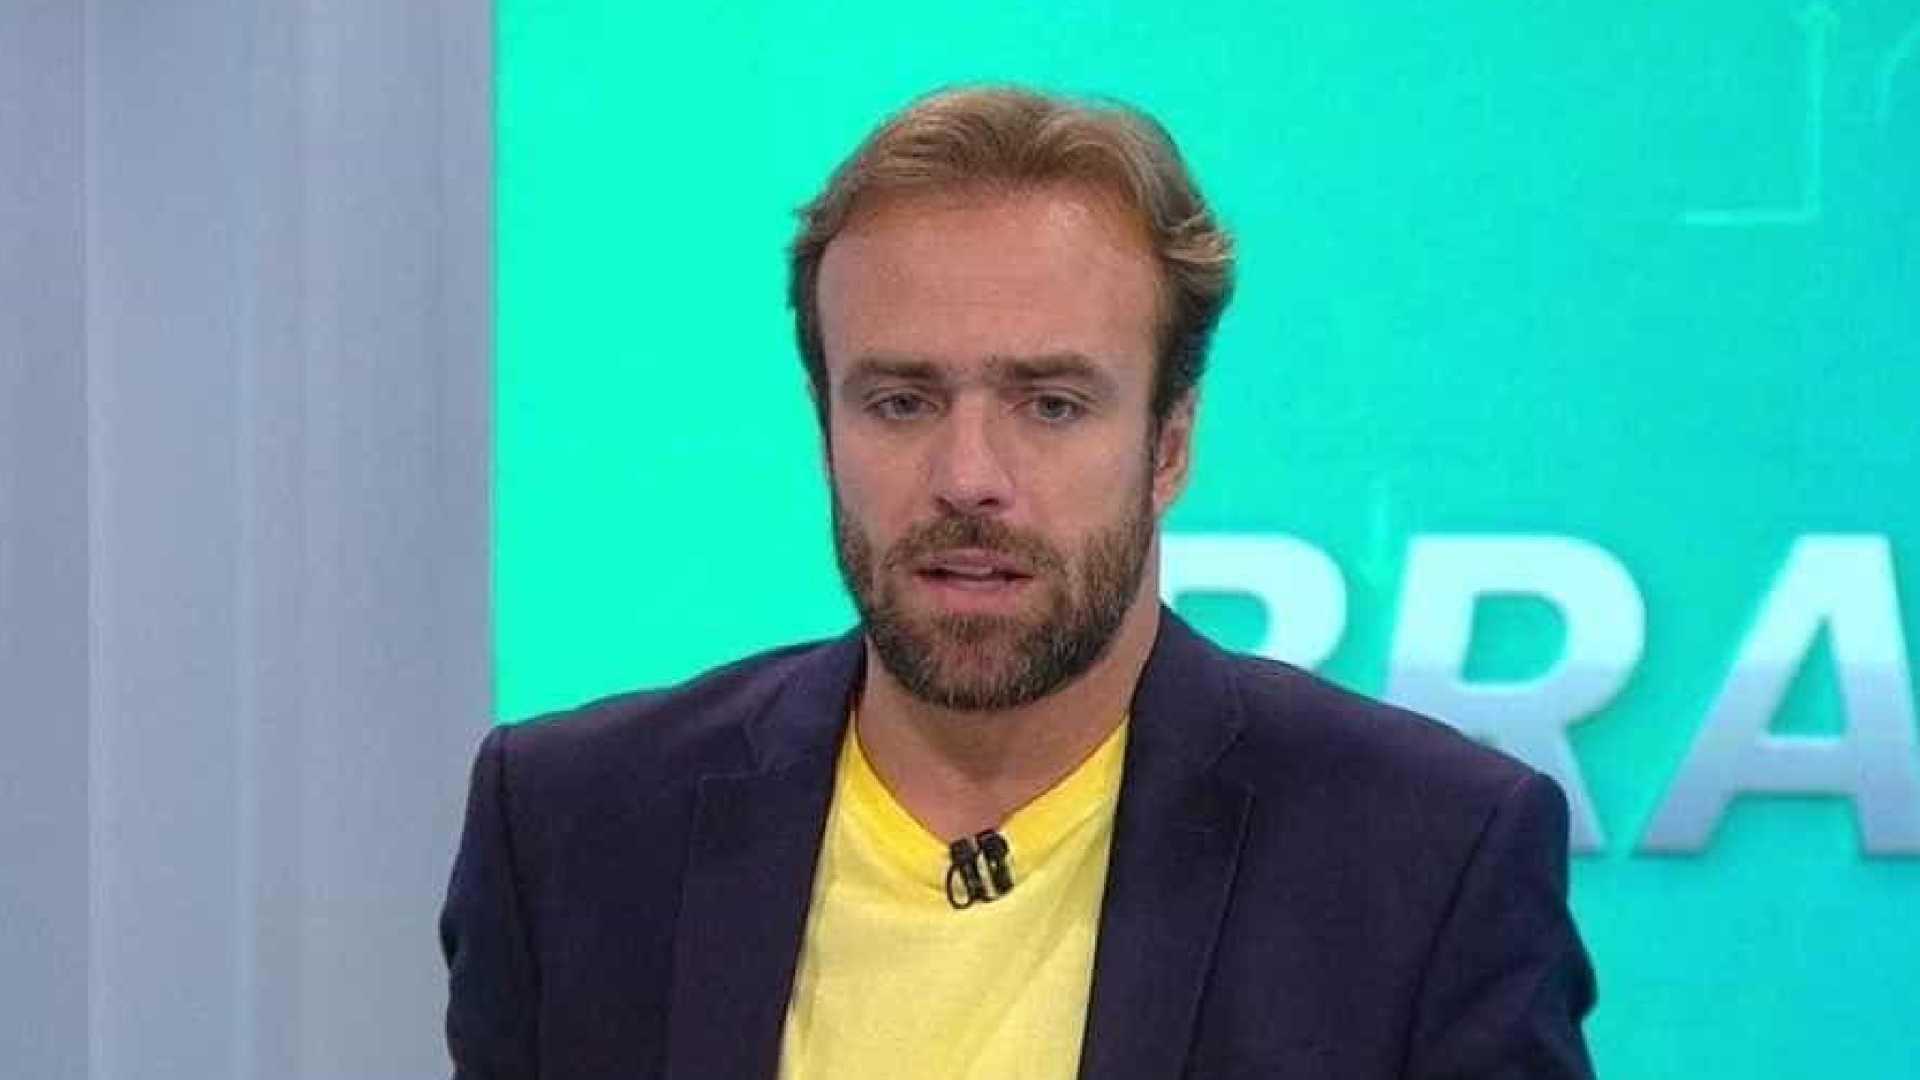 869 - Jornalista critica a Globo por preferir ex-jogadores como comentaristas